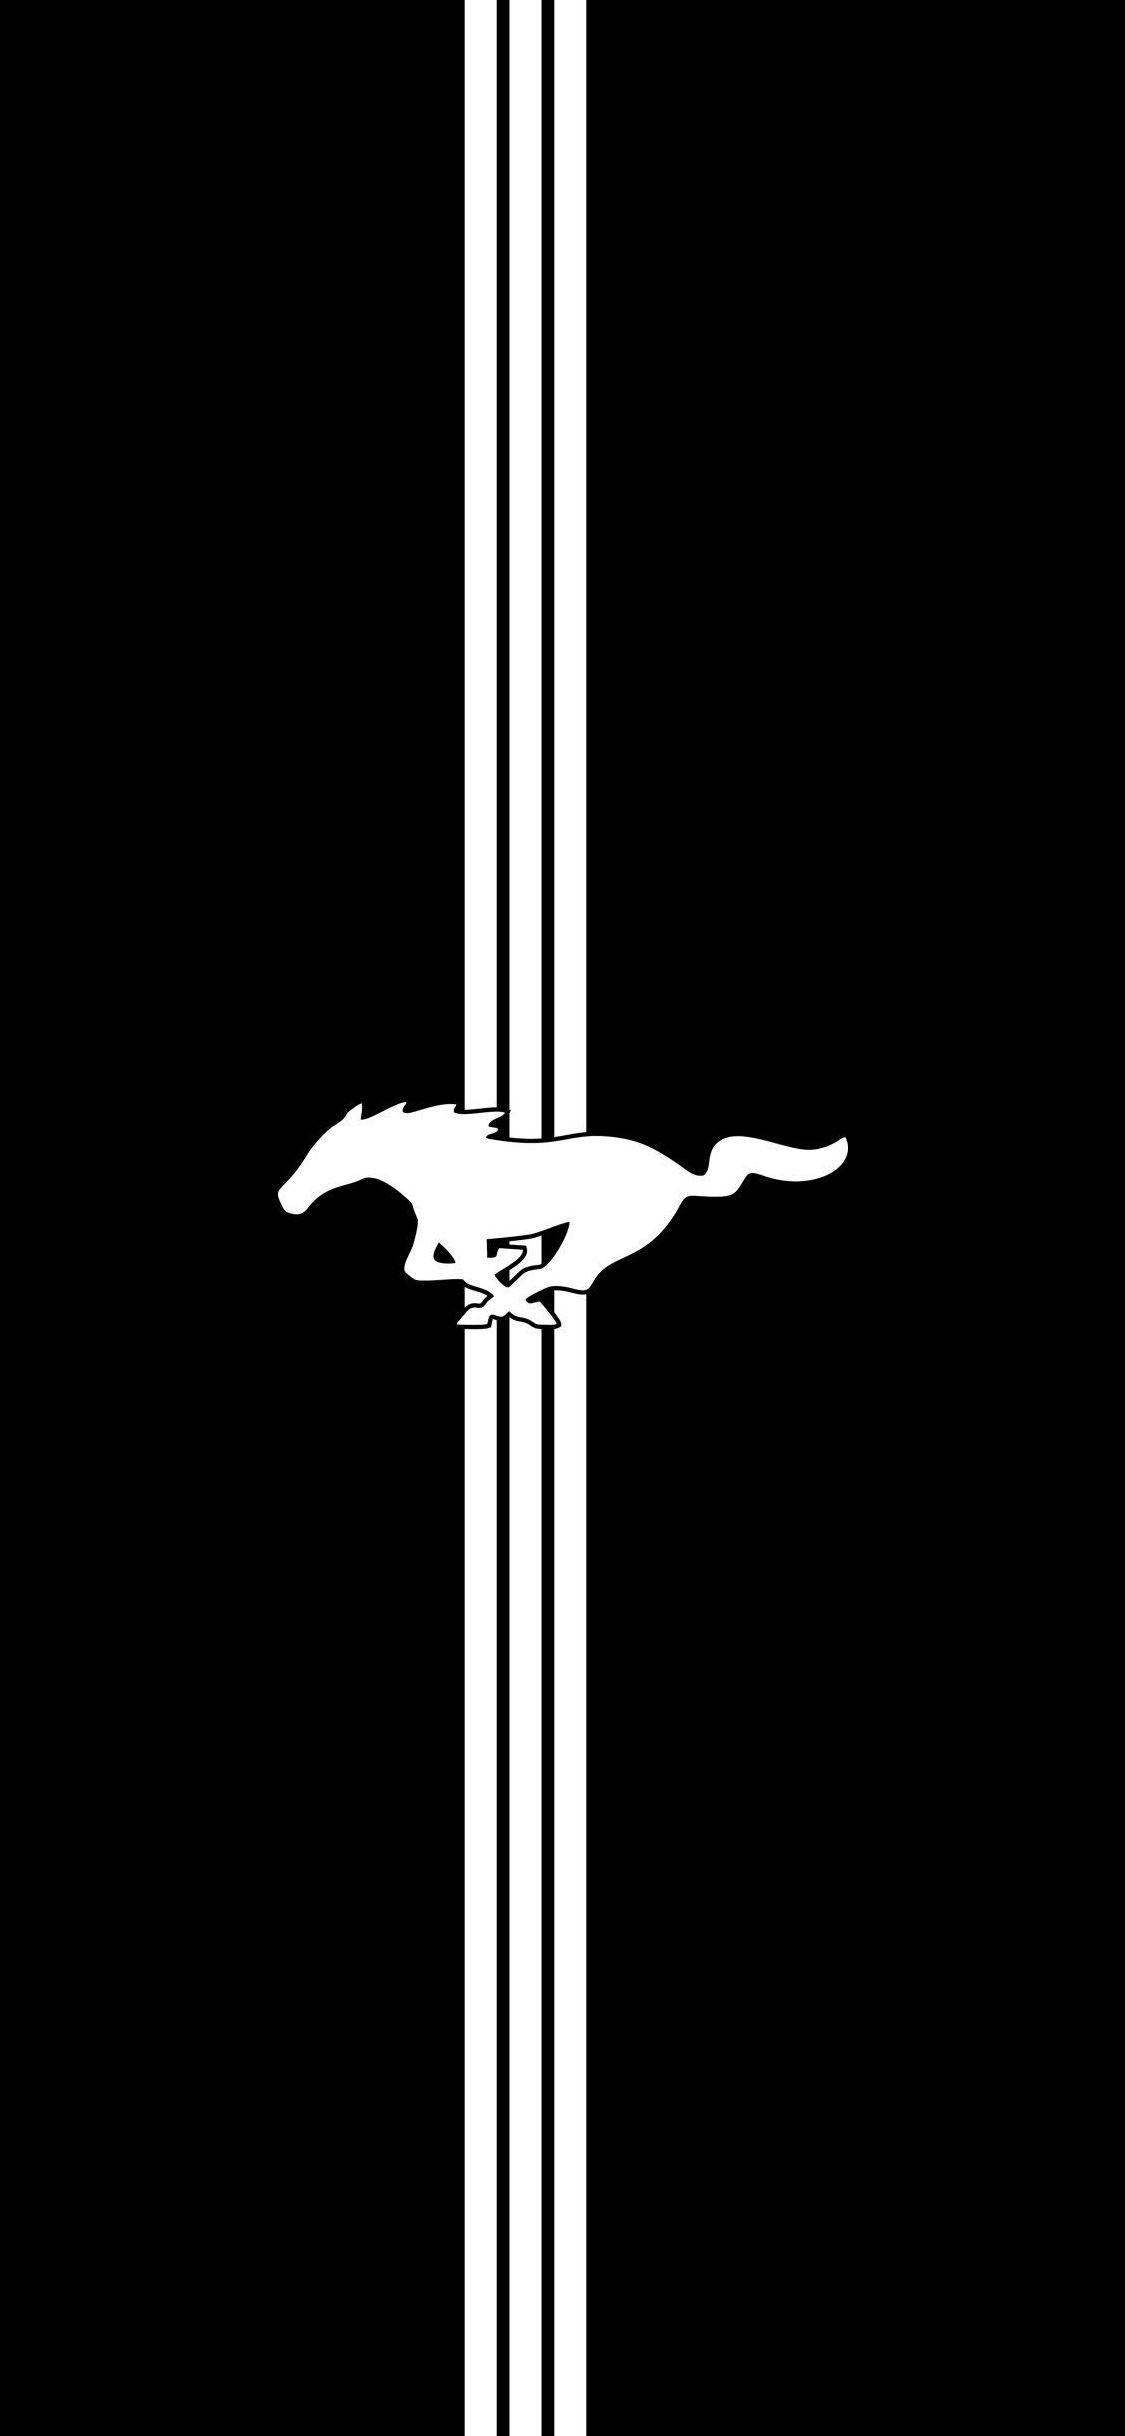 #Wallpaper #iPhone #Car #Mustang #BlackAndWhite   Mustang ...